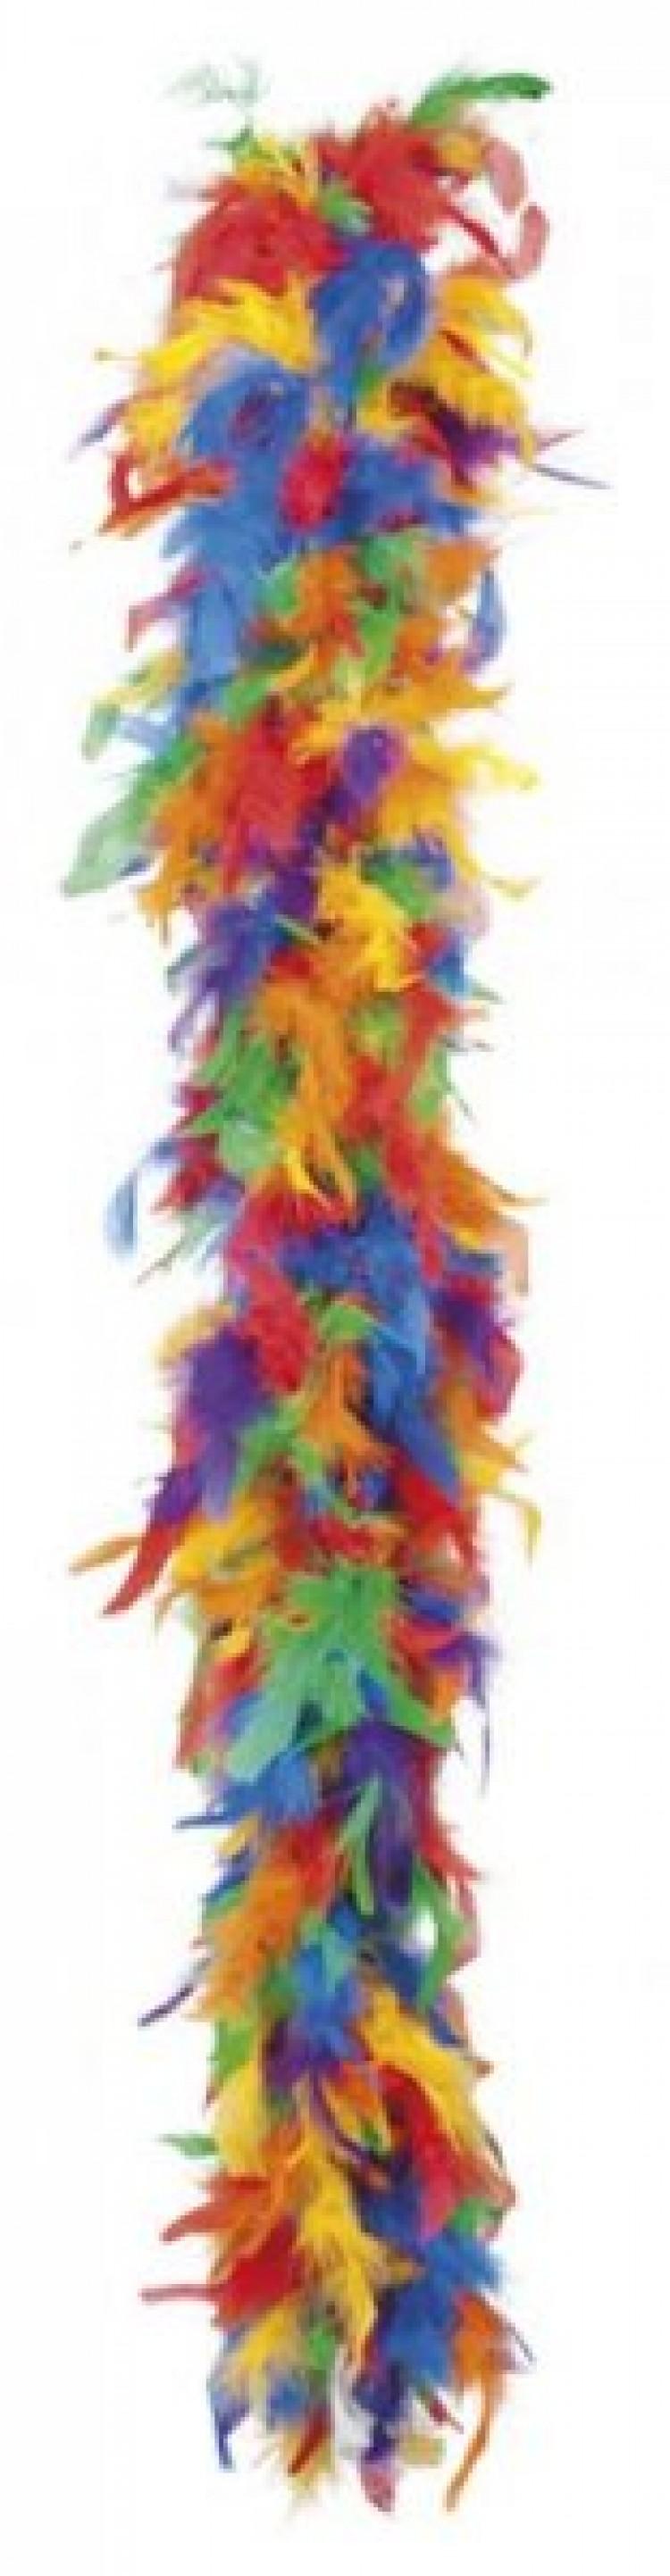 Rainbow Feather Boa